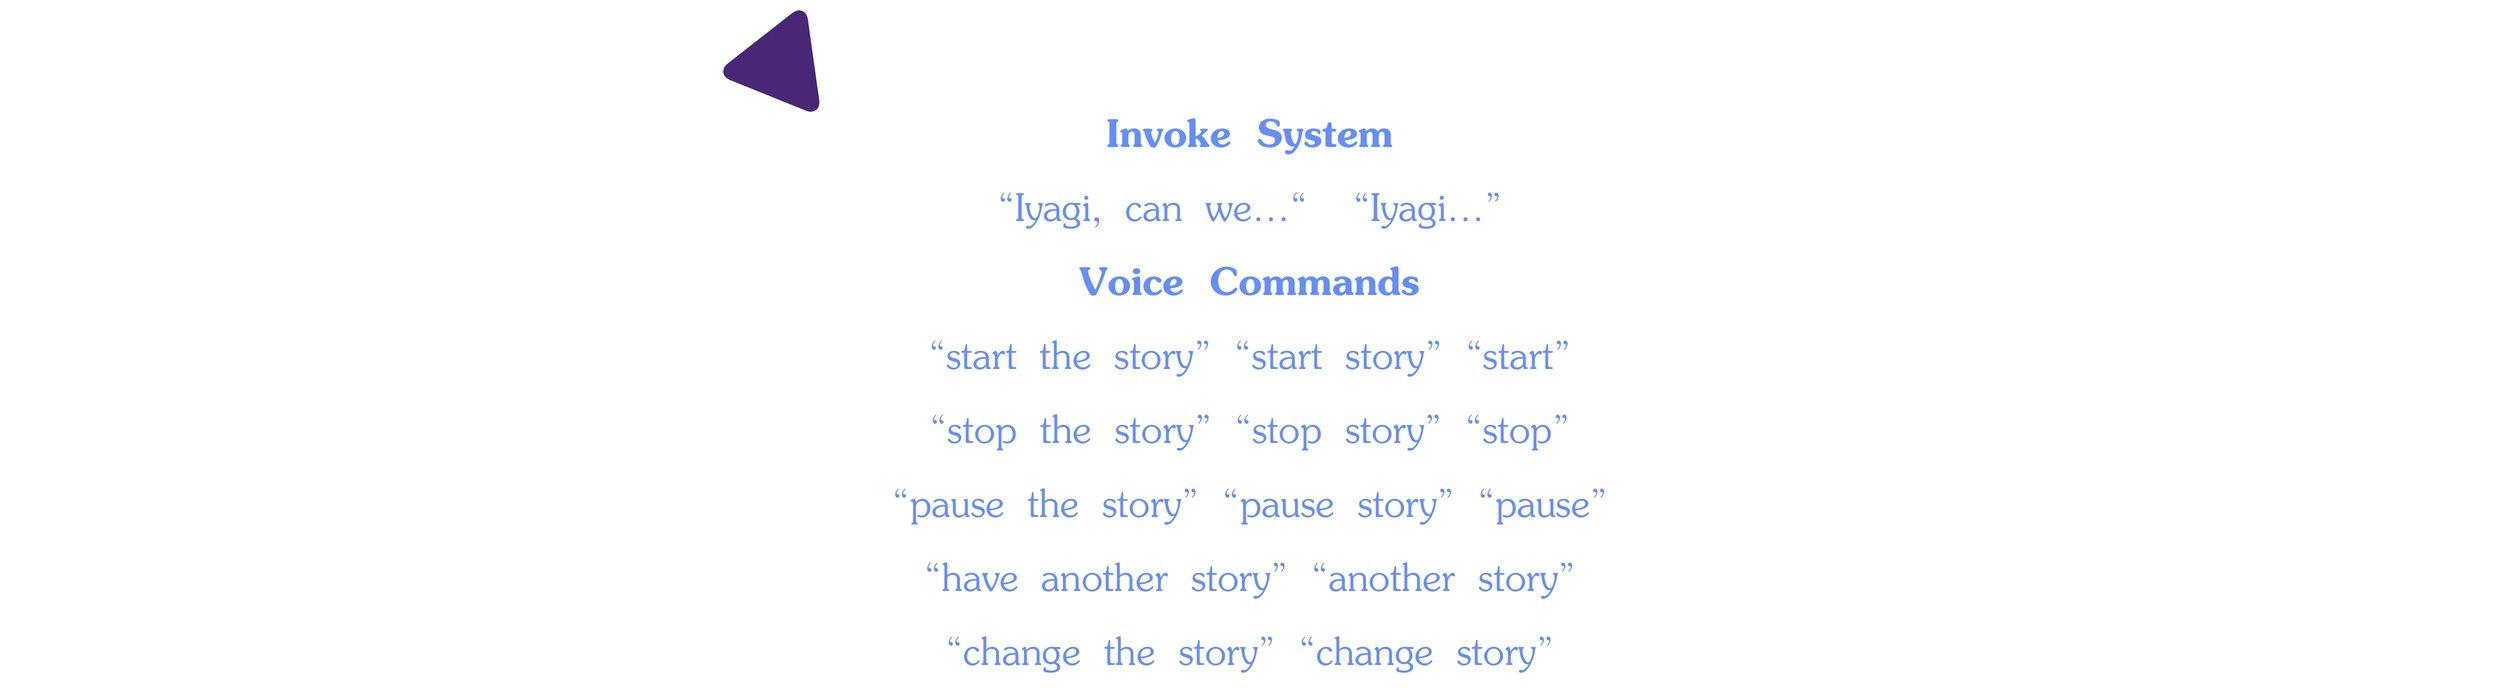 voice interactions.jpg